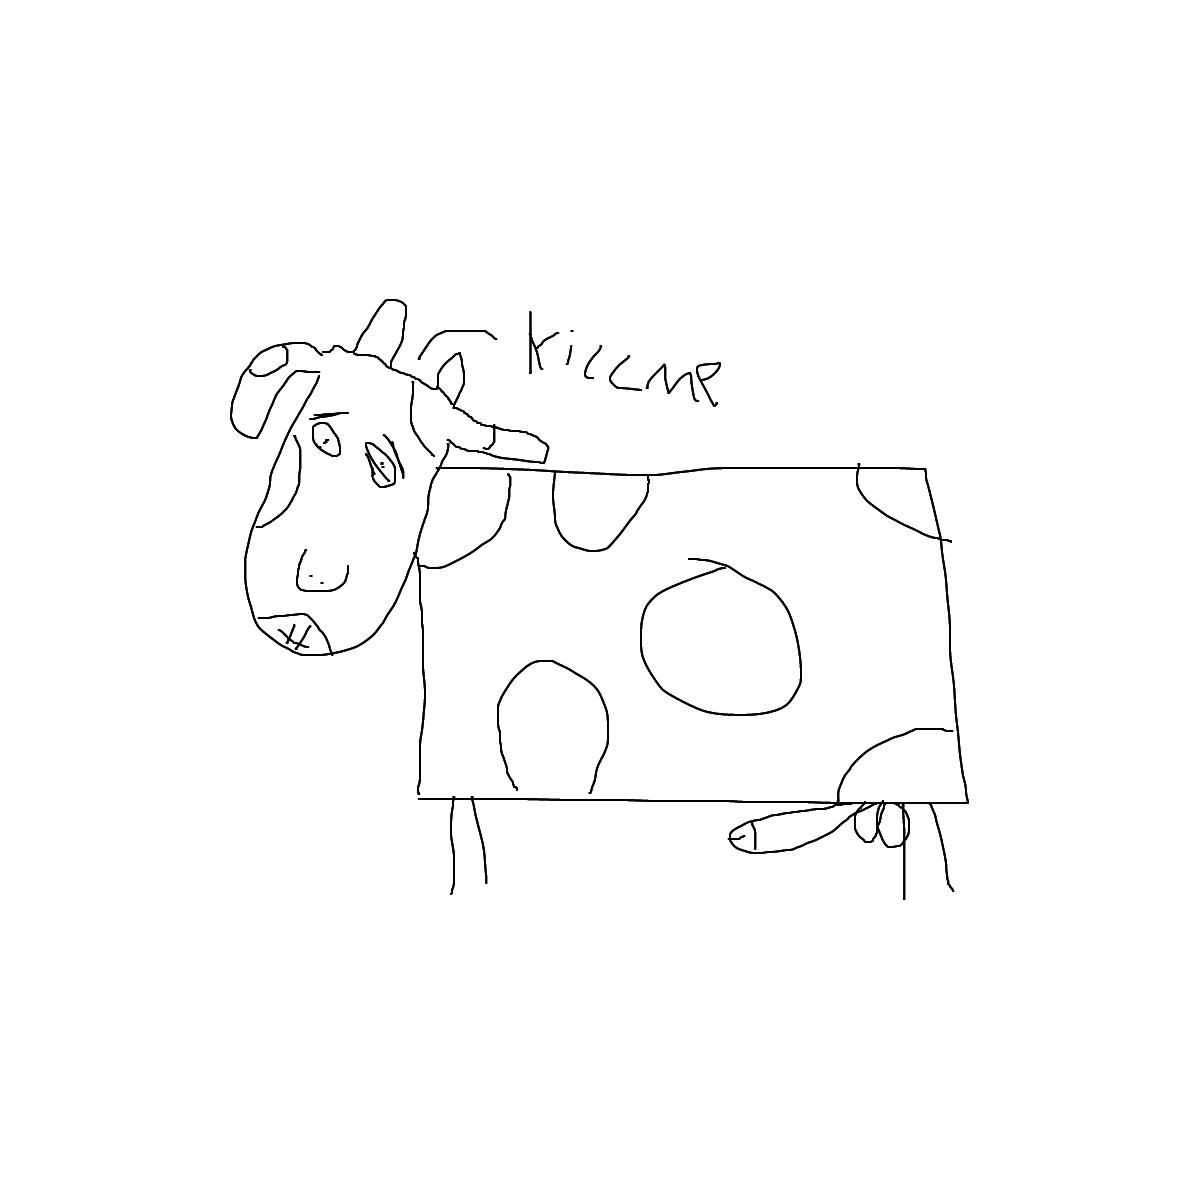 BAAAM drawing#762 lat:51.8737182617187500lng: 5.7755212783813480